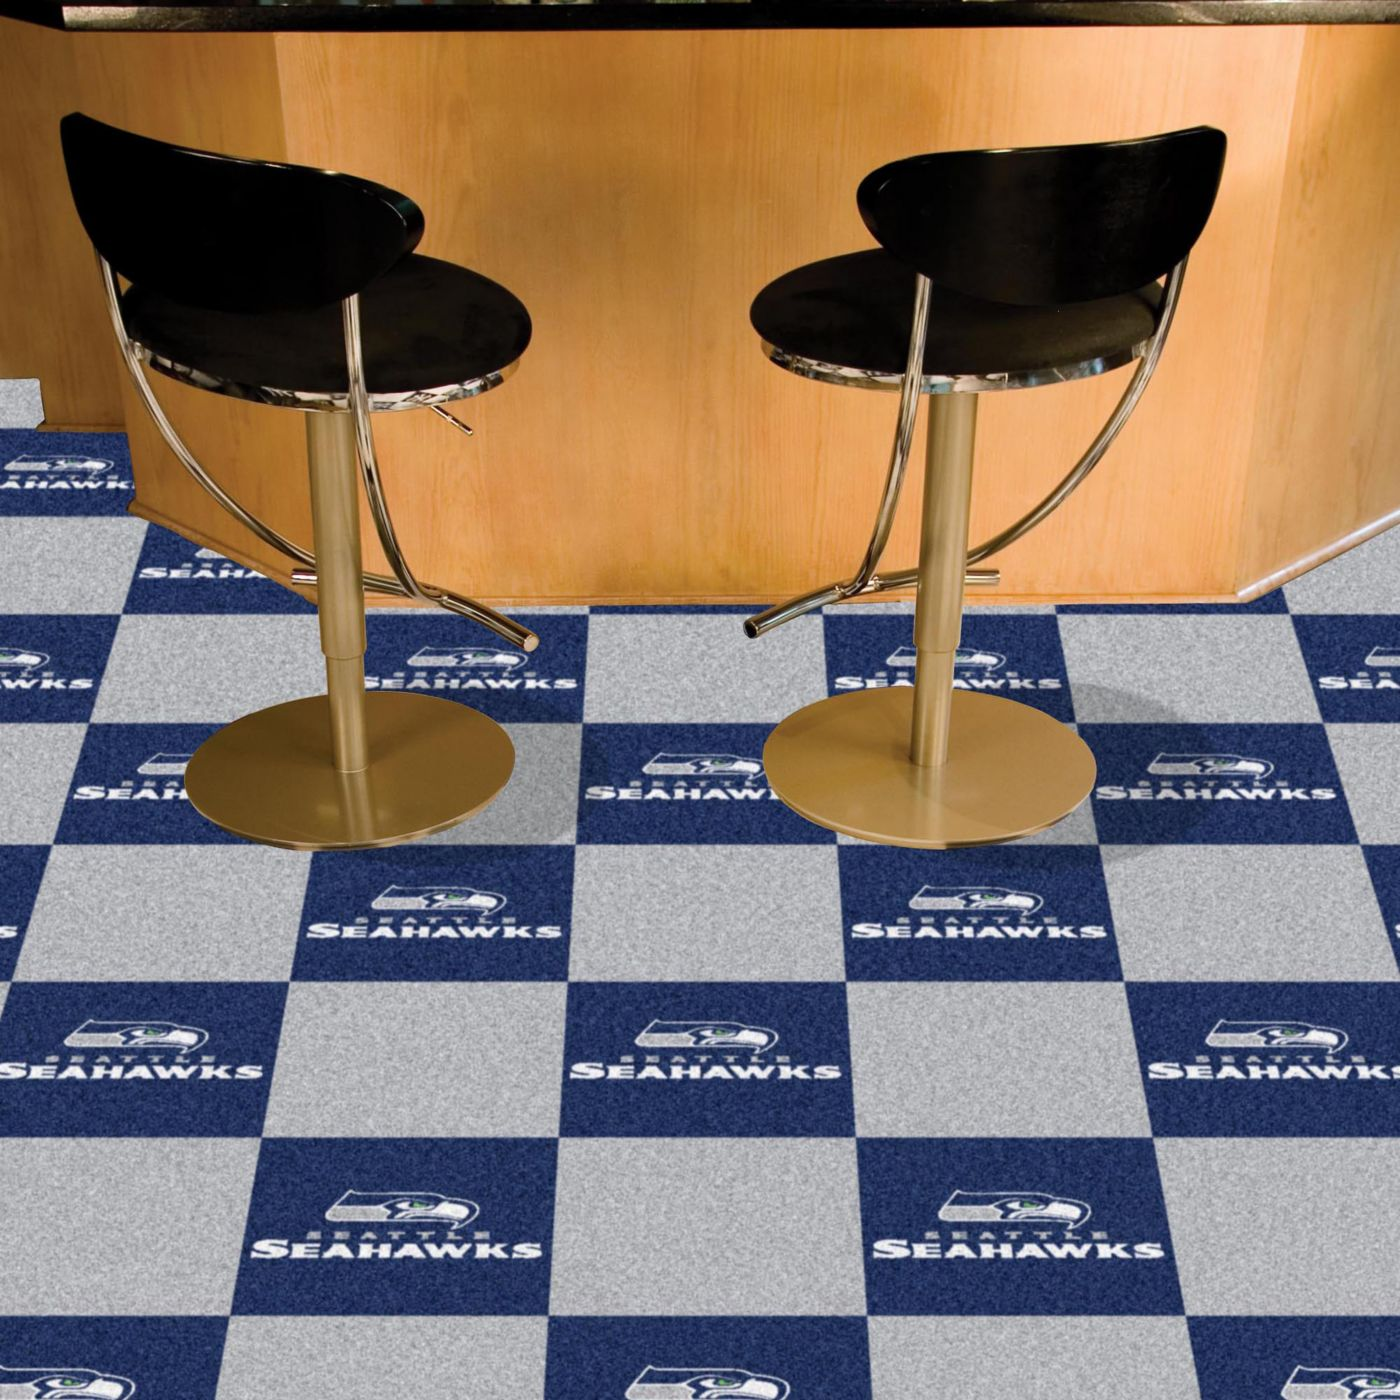 FANMATS Seattle Seahawks Team Carpet Tiles